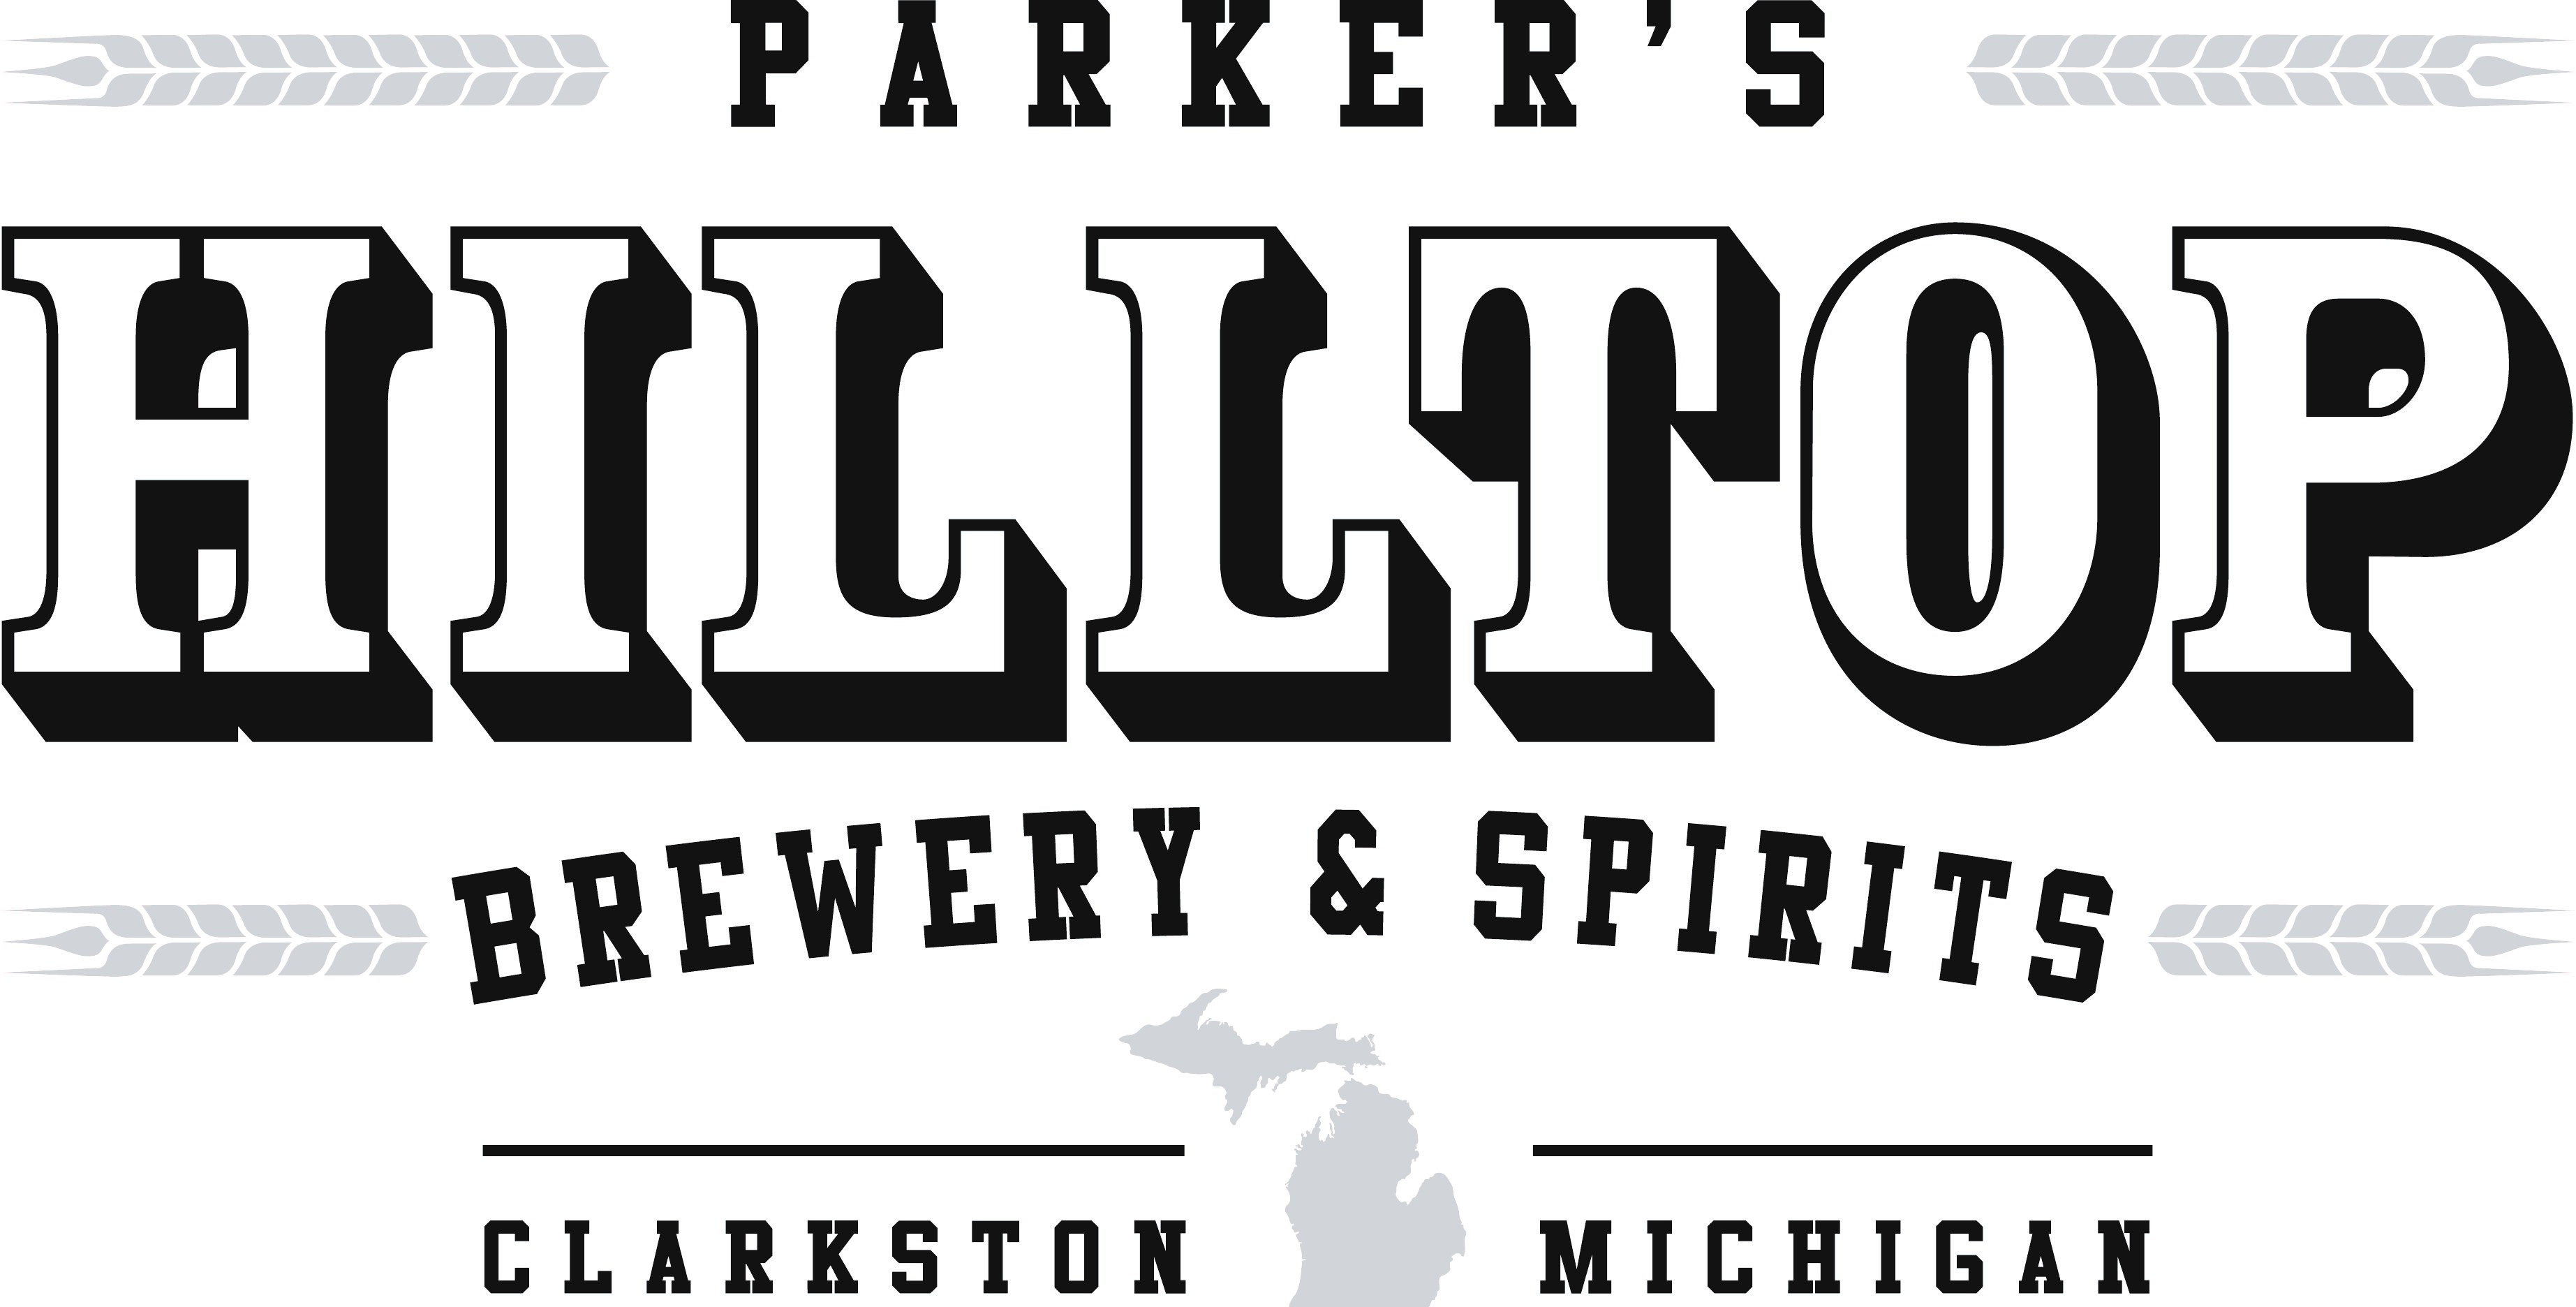 parker's hilltop brewery & spirits MI st